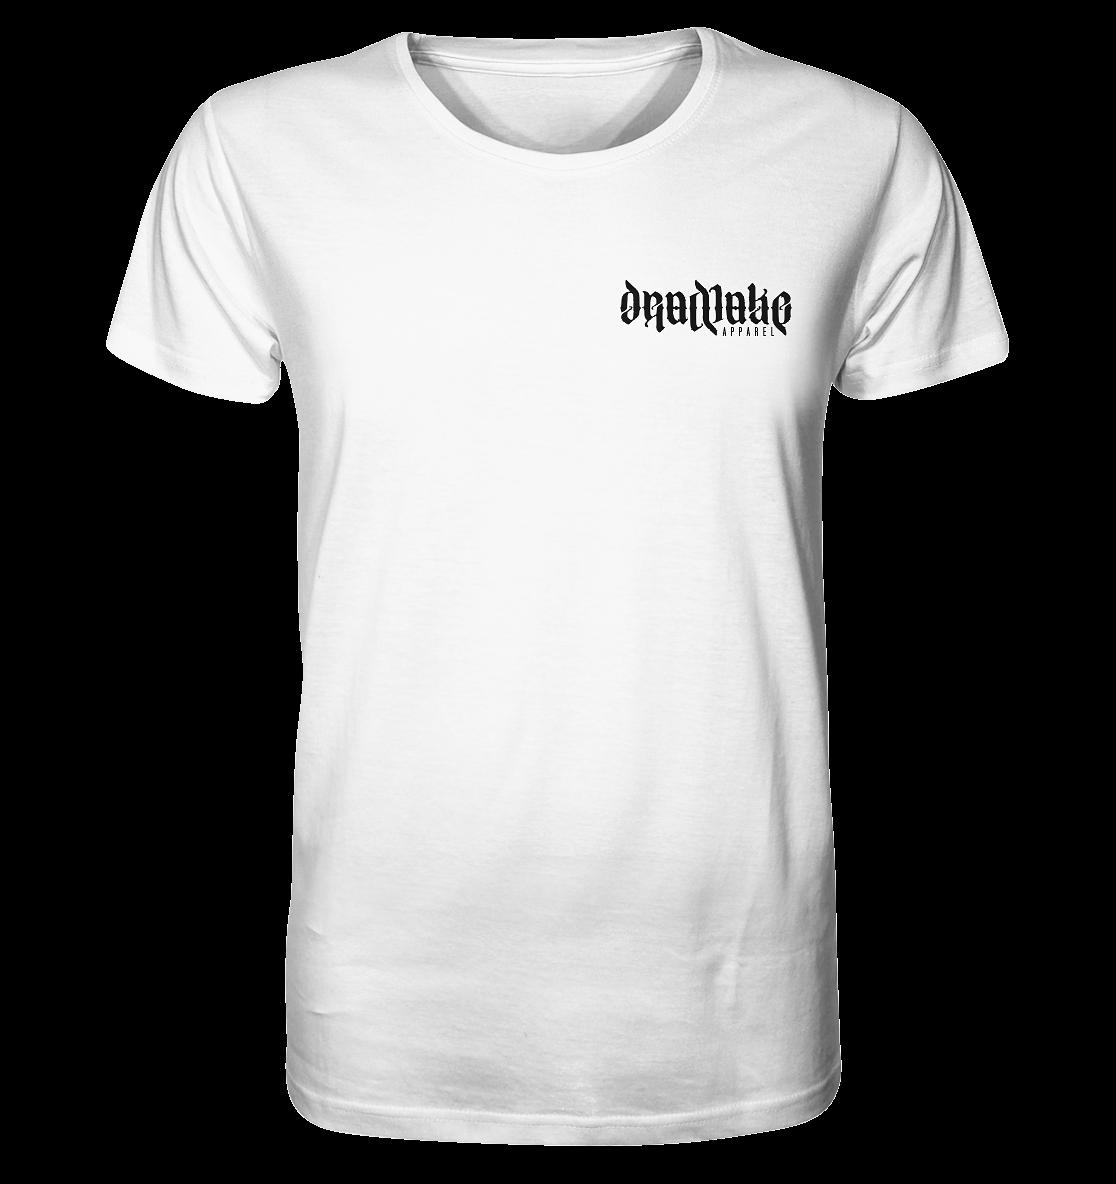 front-organic-shirt-f8f8f8-1116x-4.png